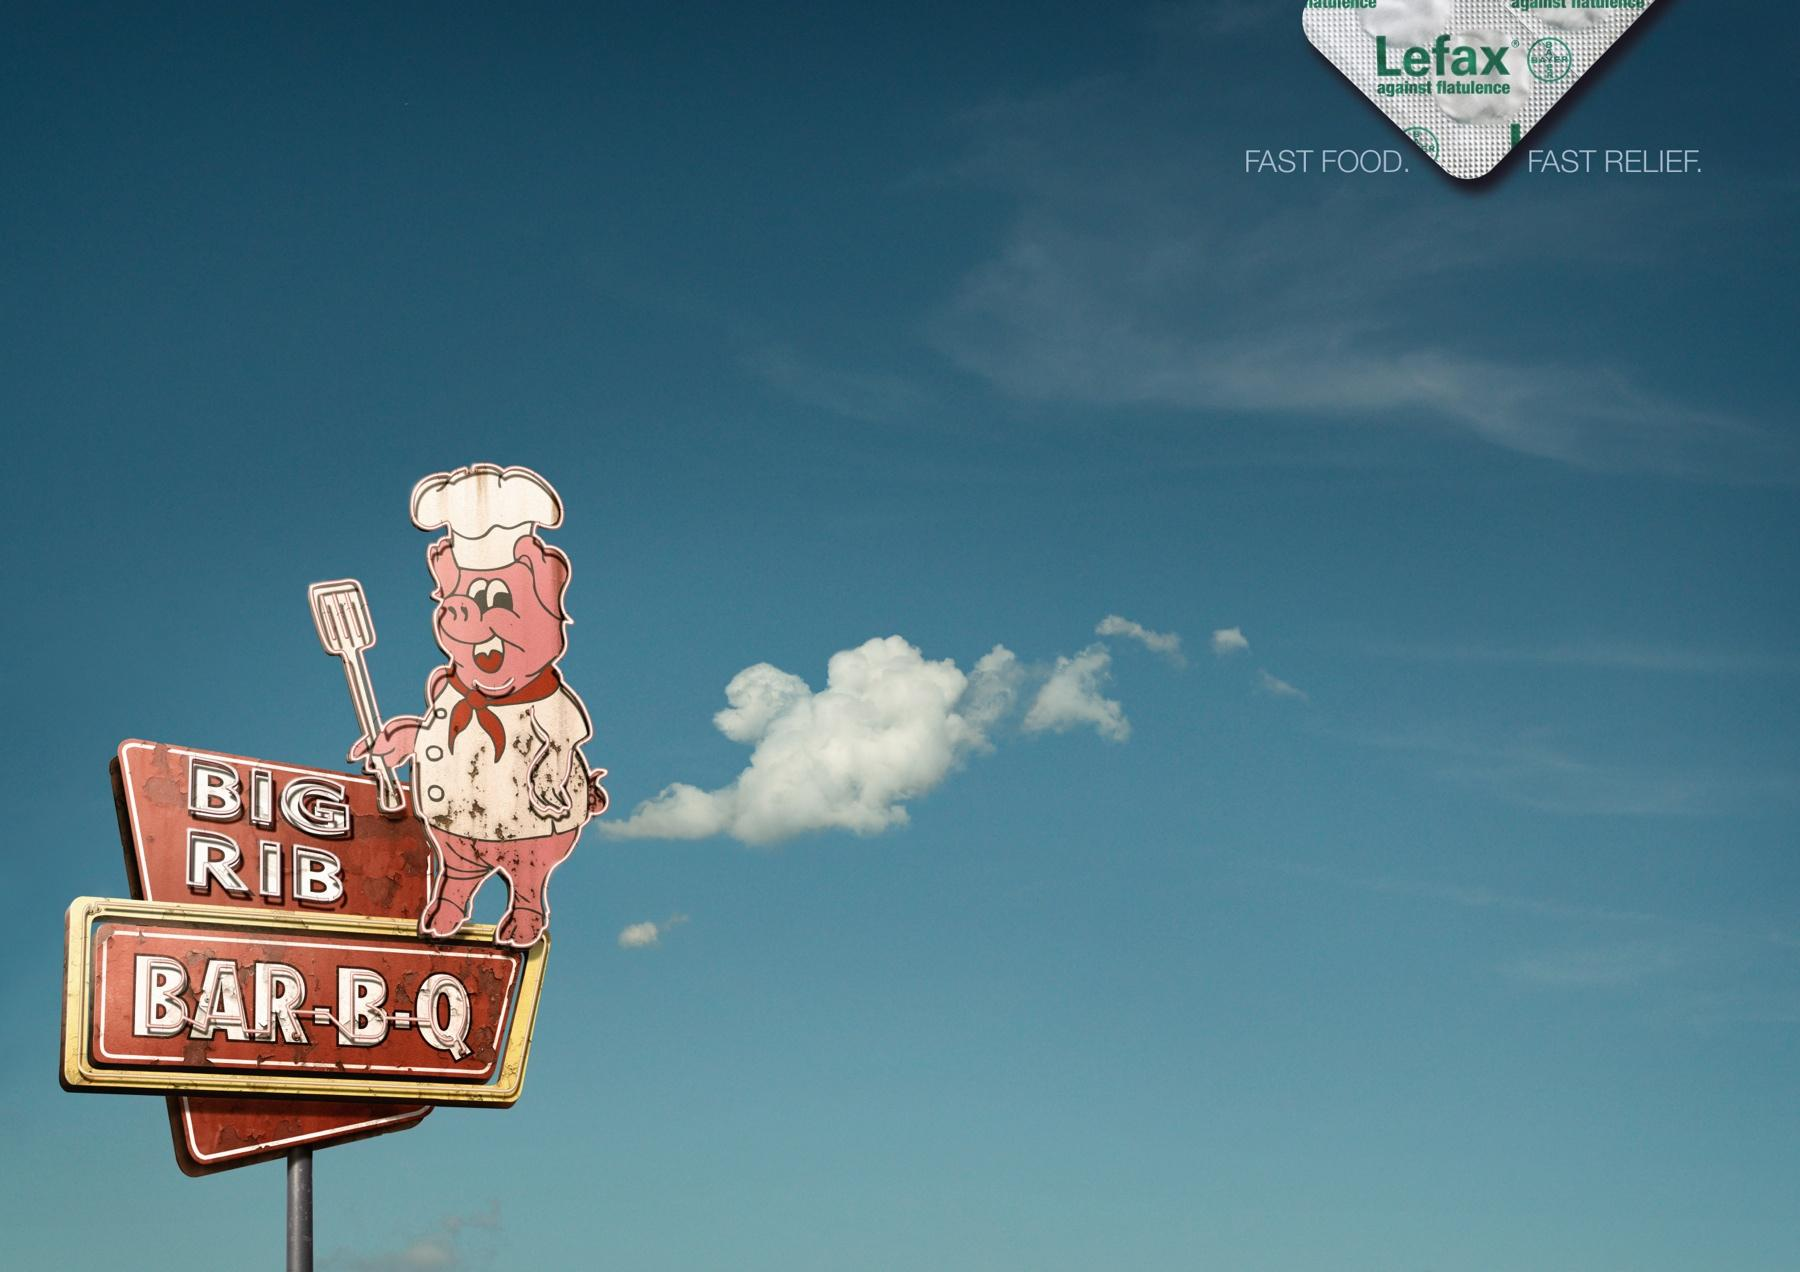 Enzym Lefax Print Ad -  Fast food flatulence, Pig